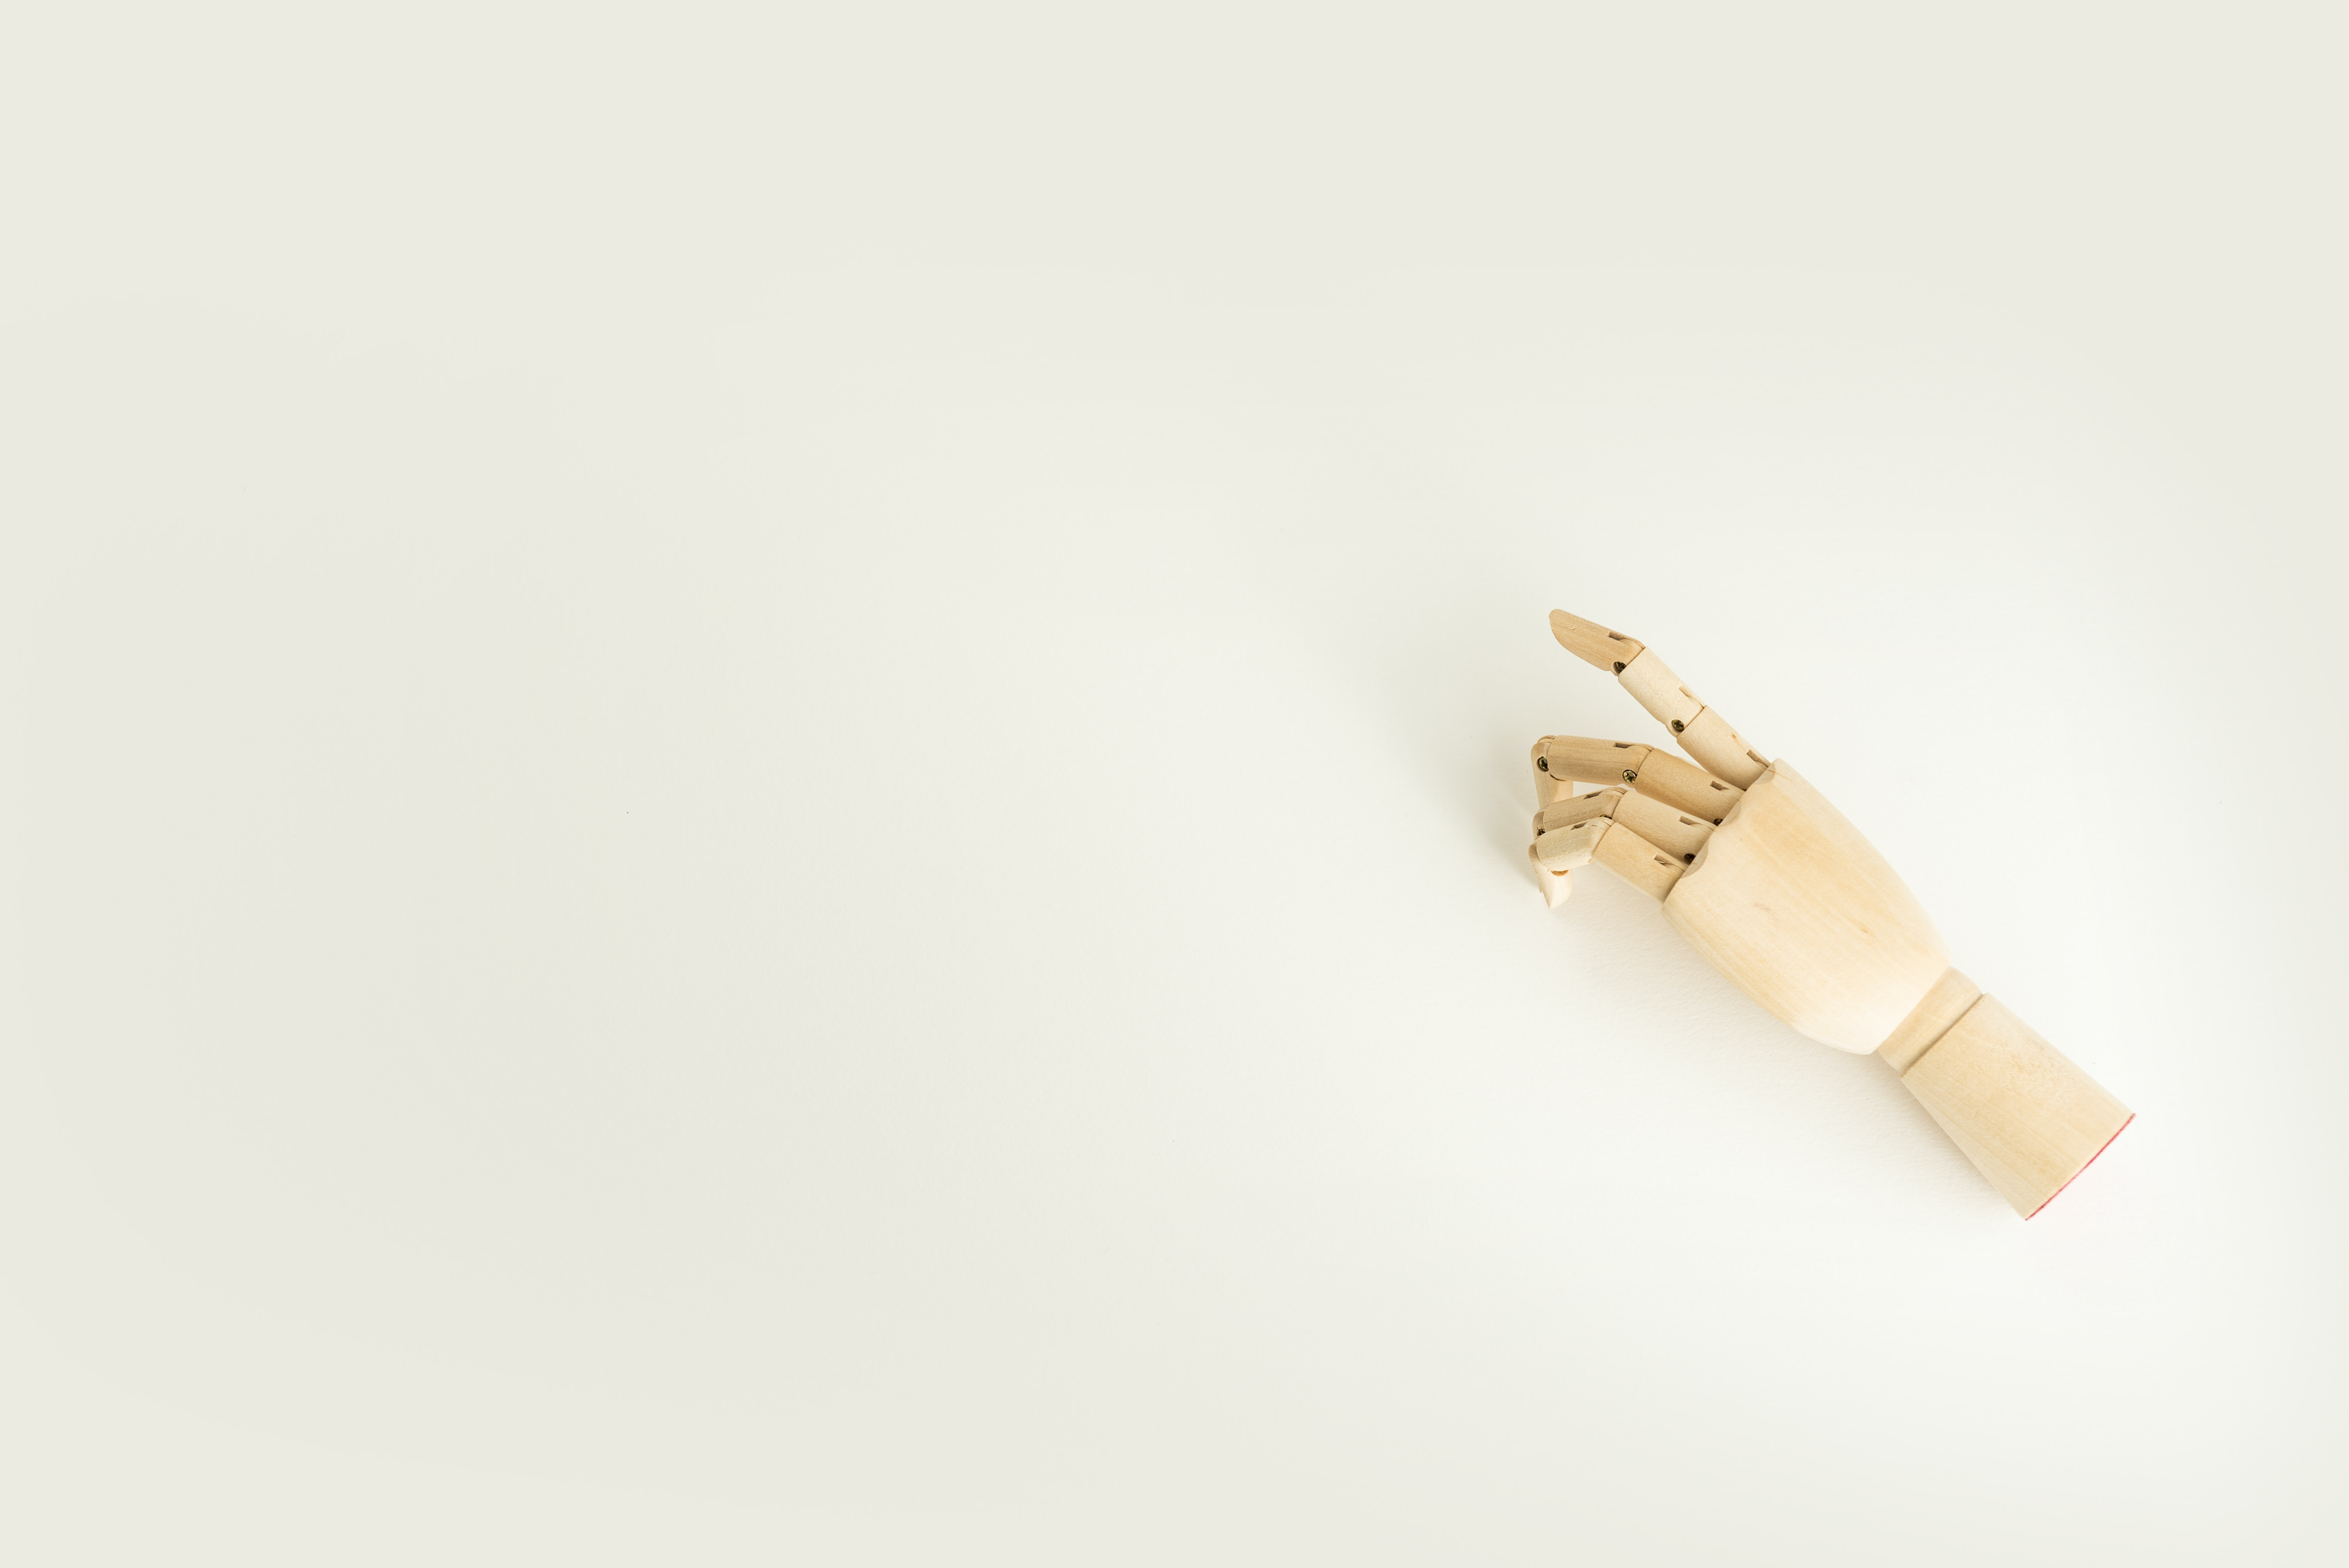 brown wooden hand mannequin